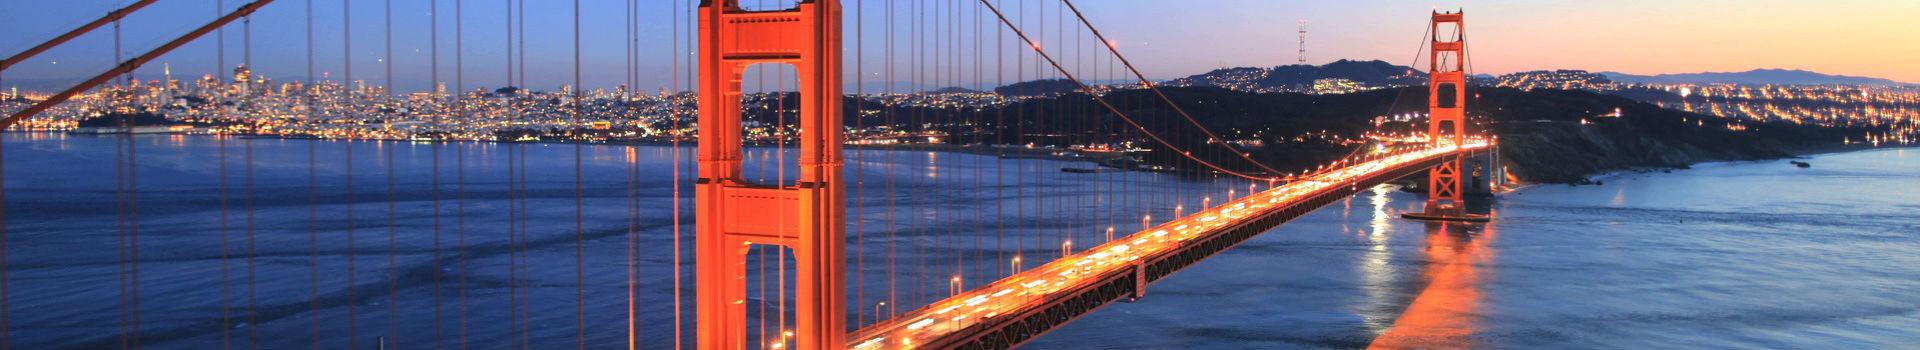 golden_gate_bridge_sunset_lights_350